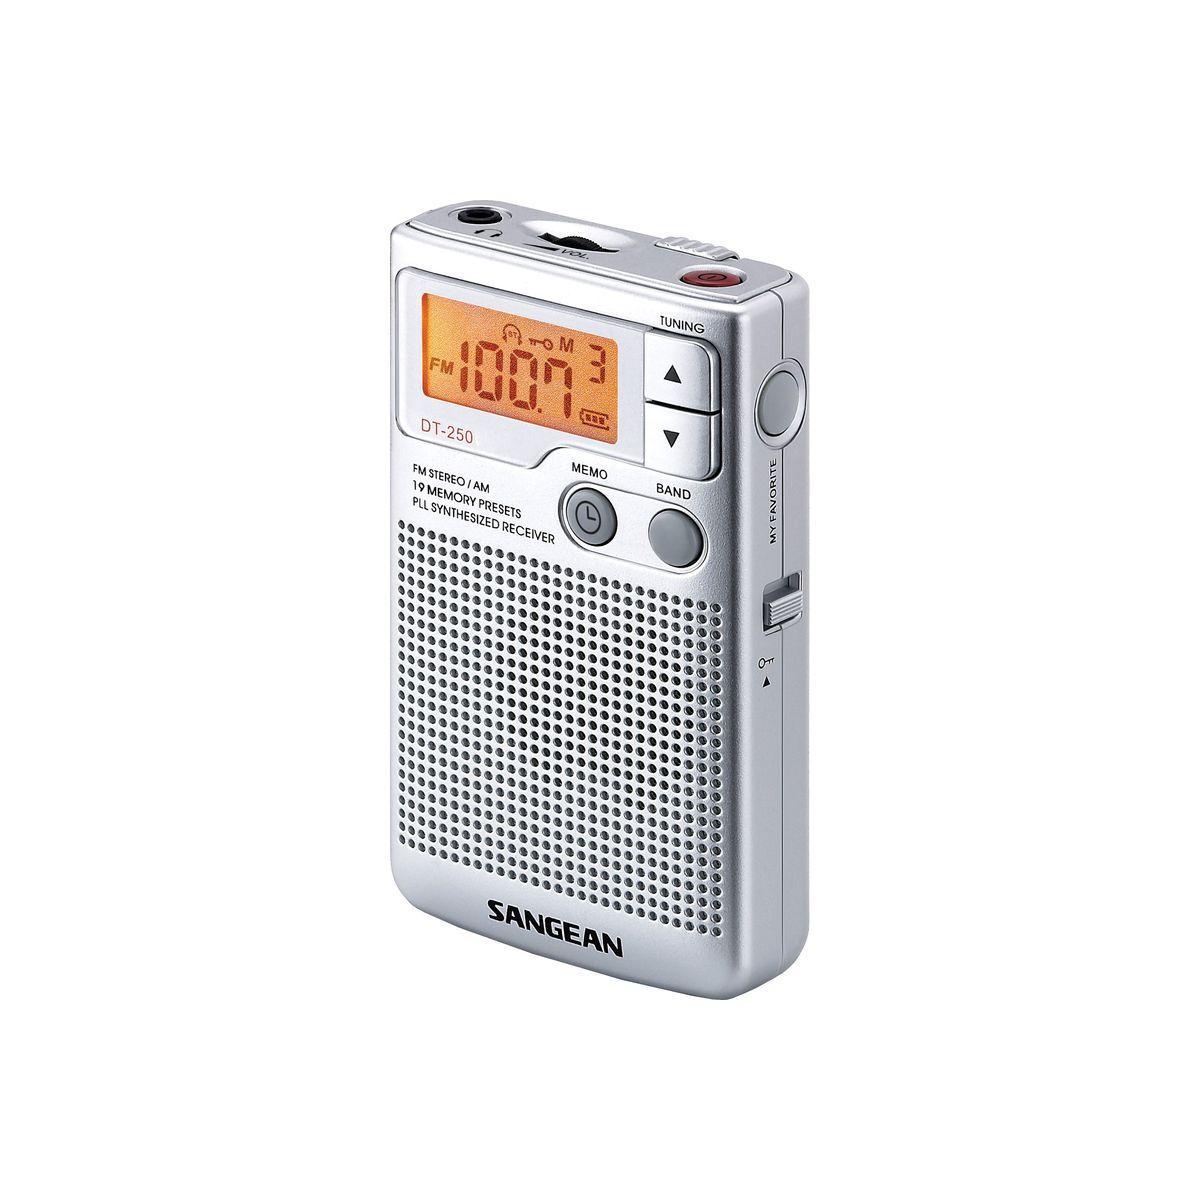 Radio analogique sangean pocket 250 argent - 2% de remise imm?...